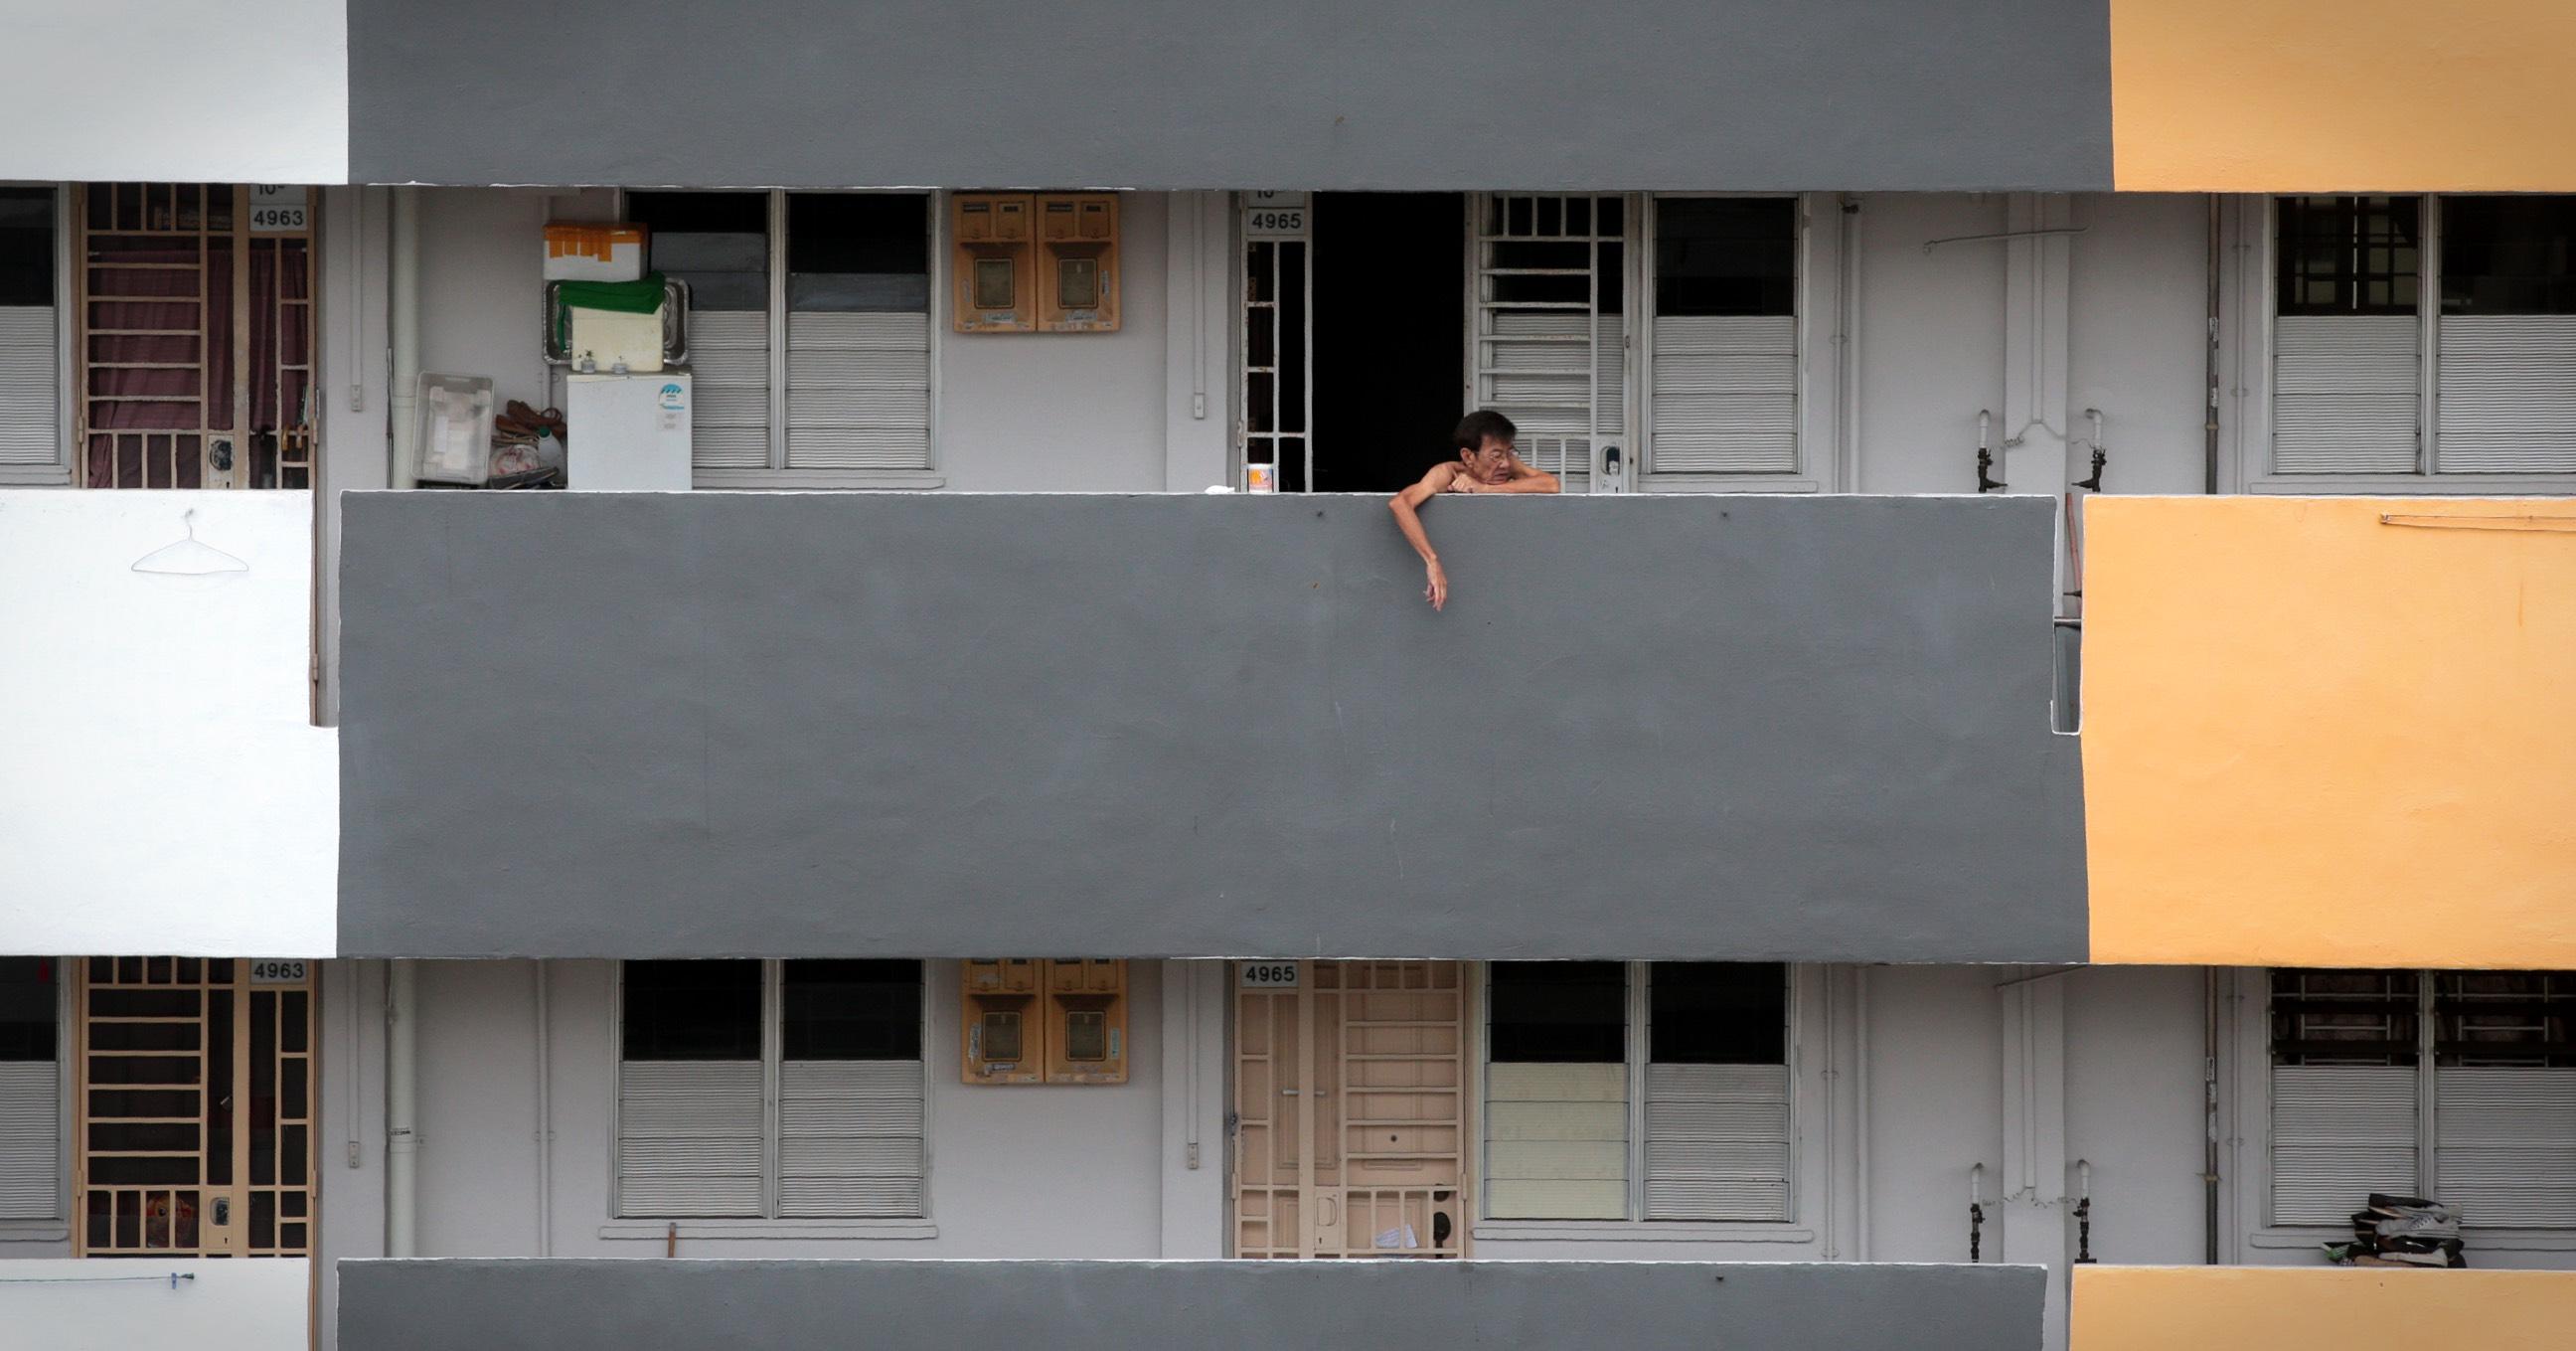 A two-room rental flat block along Ang Mo Kio Ave 6. — TODAY file photo